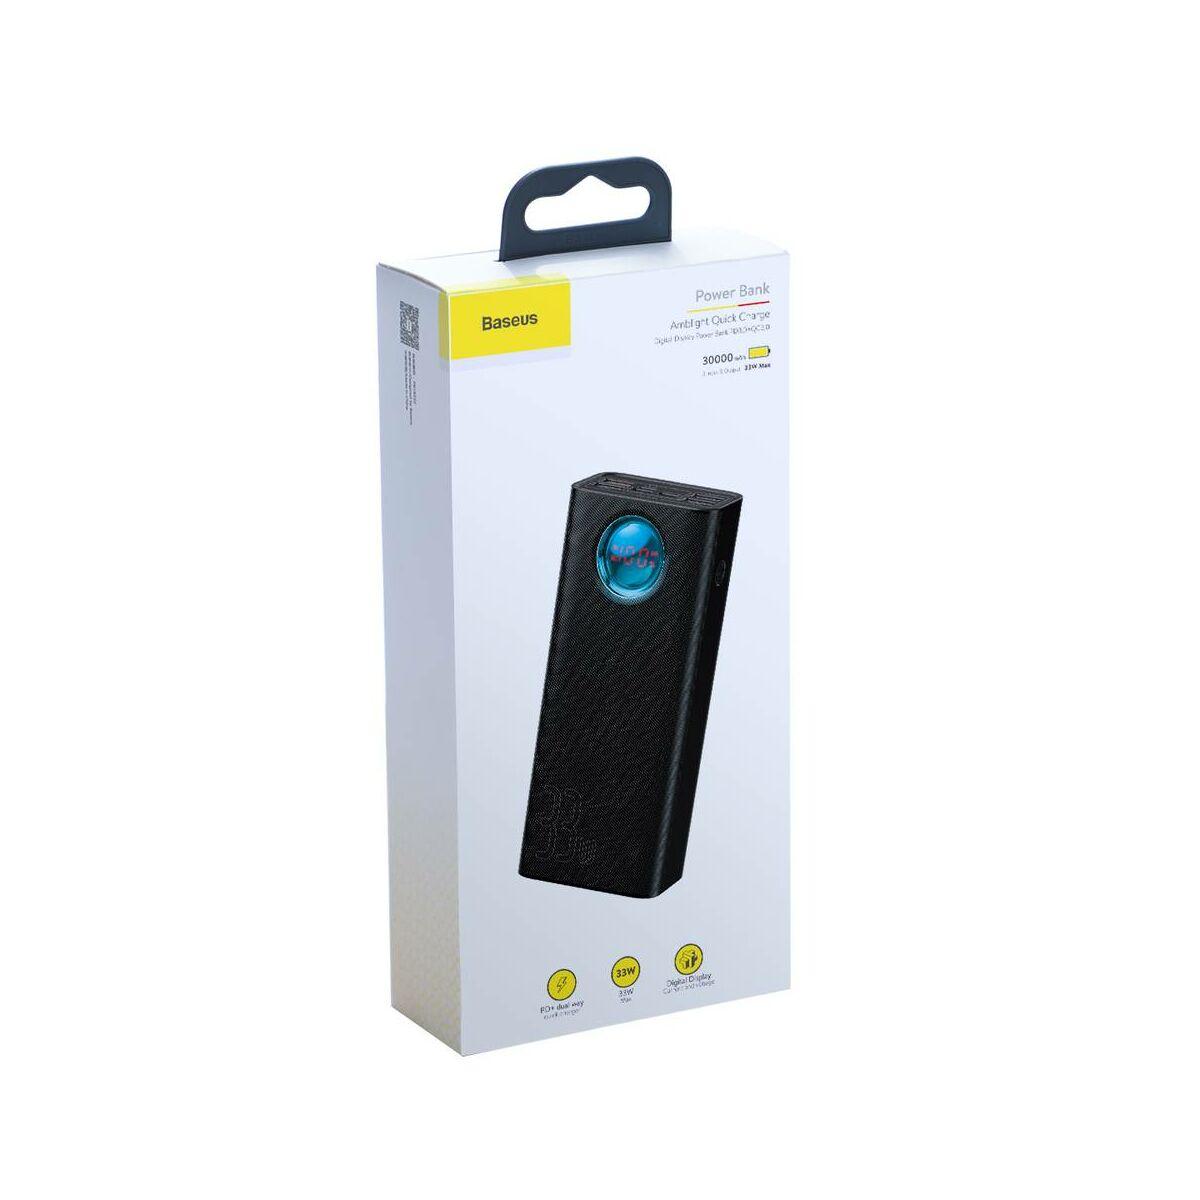 Baseus Power Bank Amblight LED kijelző PD3.0 QC3.0 4xUSB, 1xType-C 33W, 30000 mAh, fekete (PPLG-01)